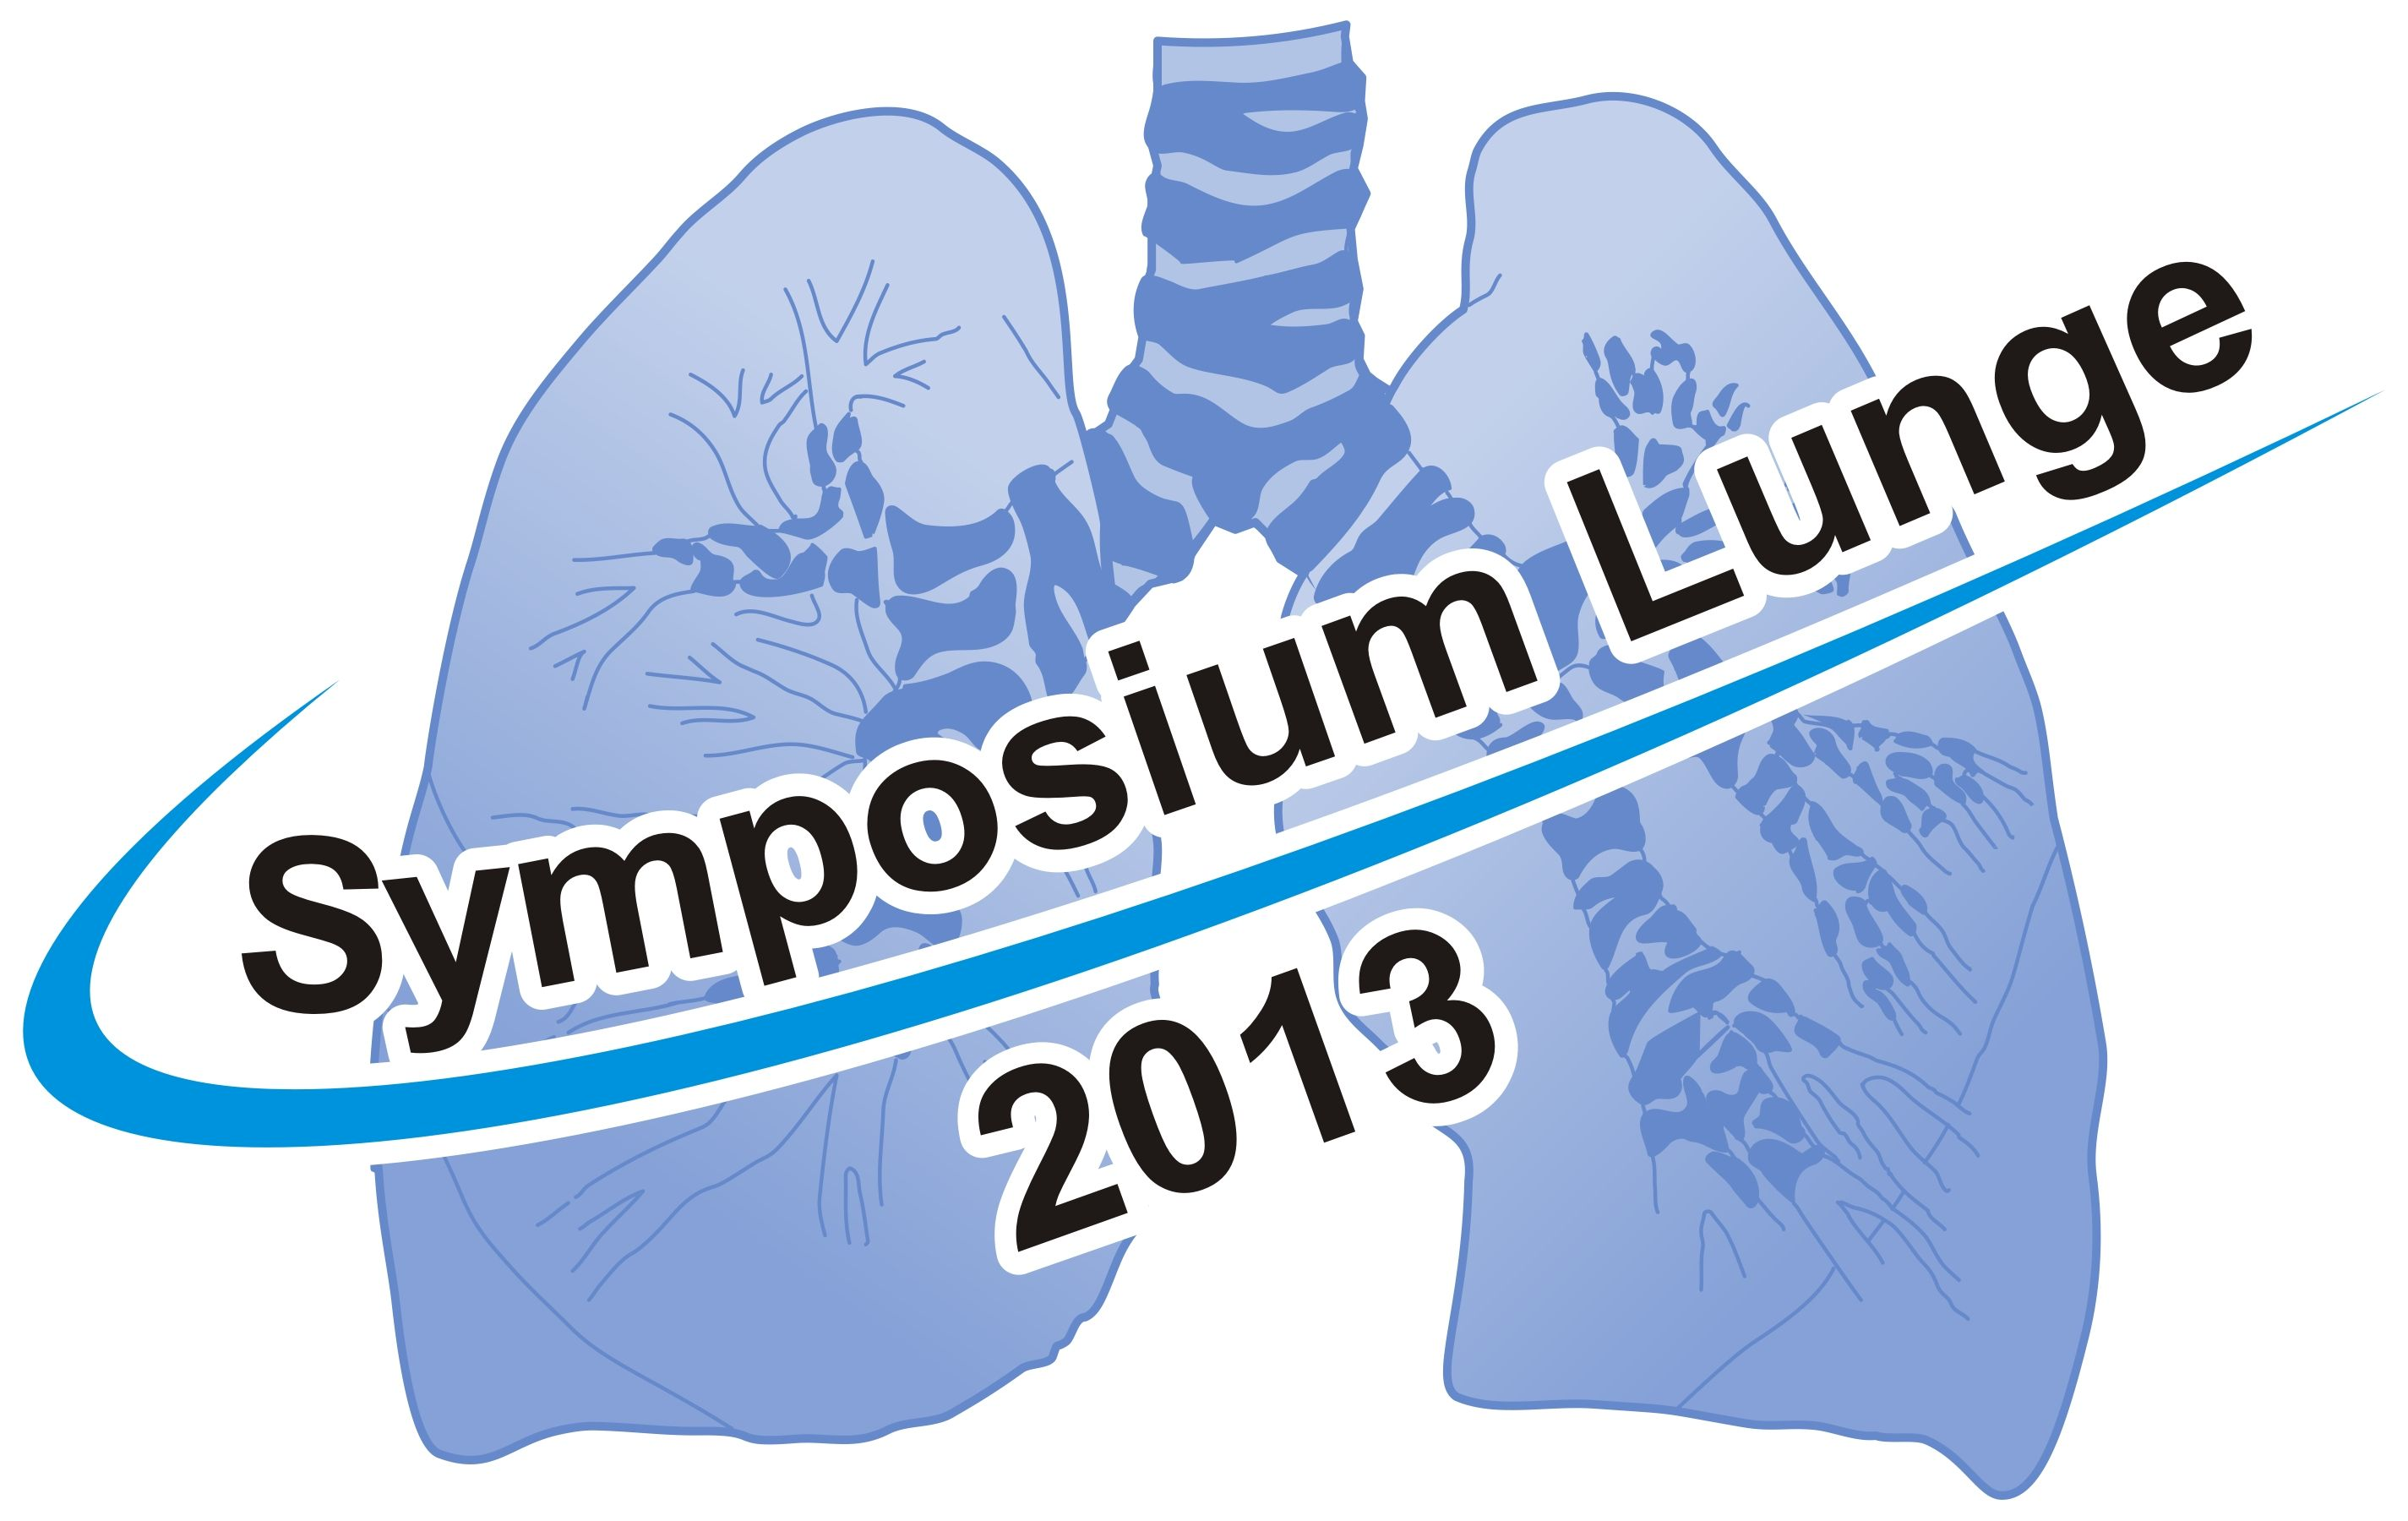 Technik-247.de - Technik Infos & Technik Tipps | Symposium-Lunge 2013